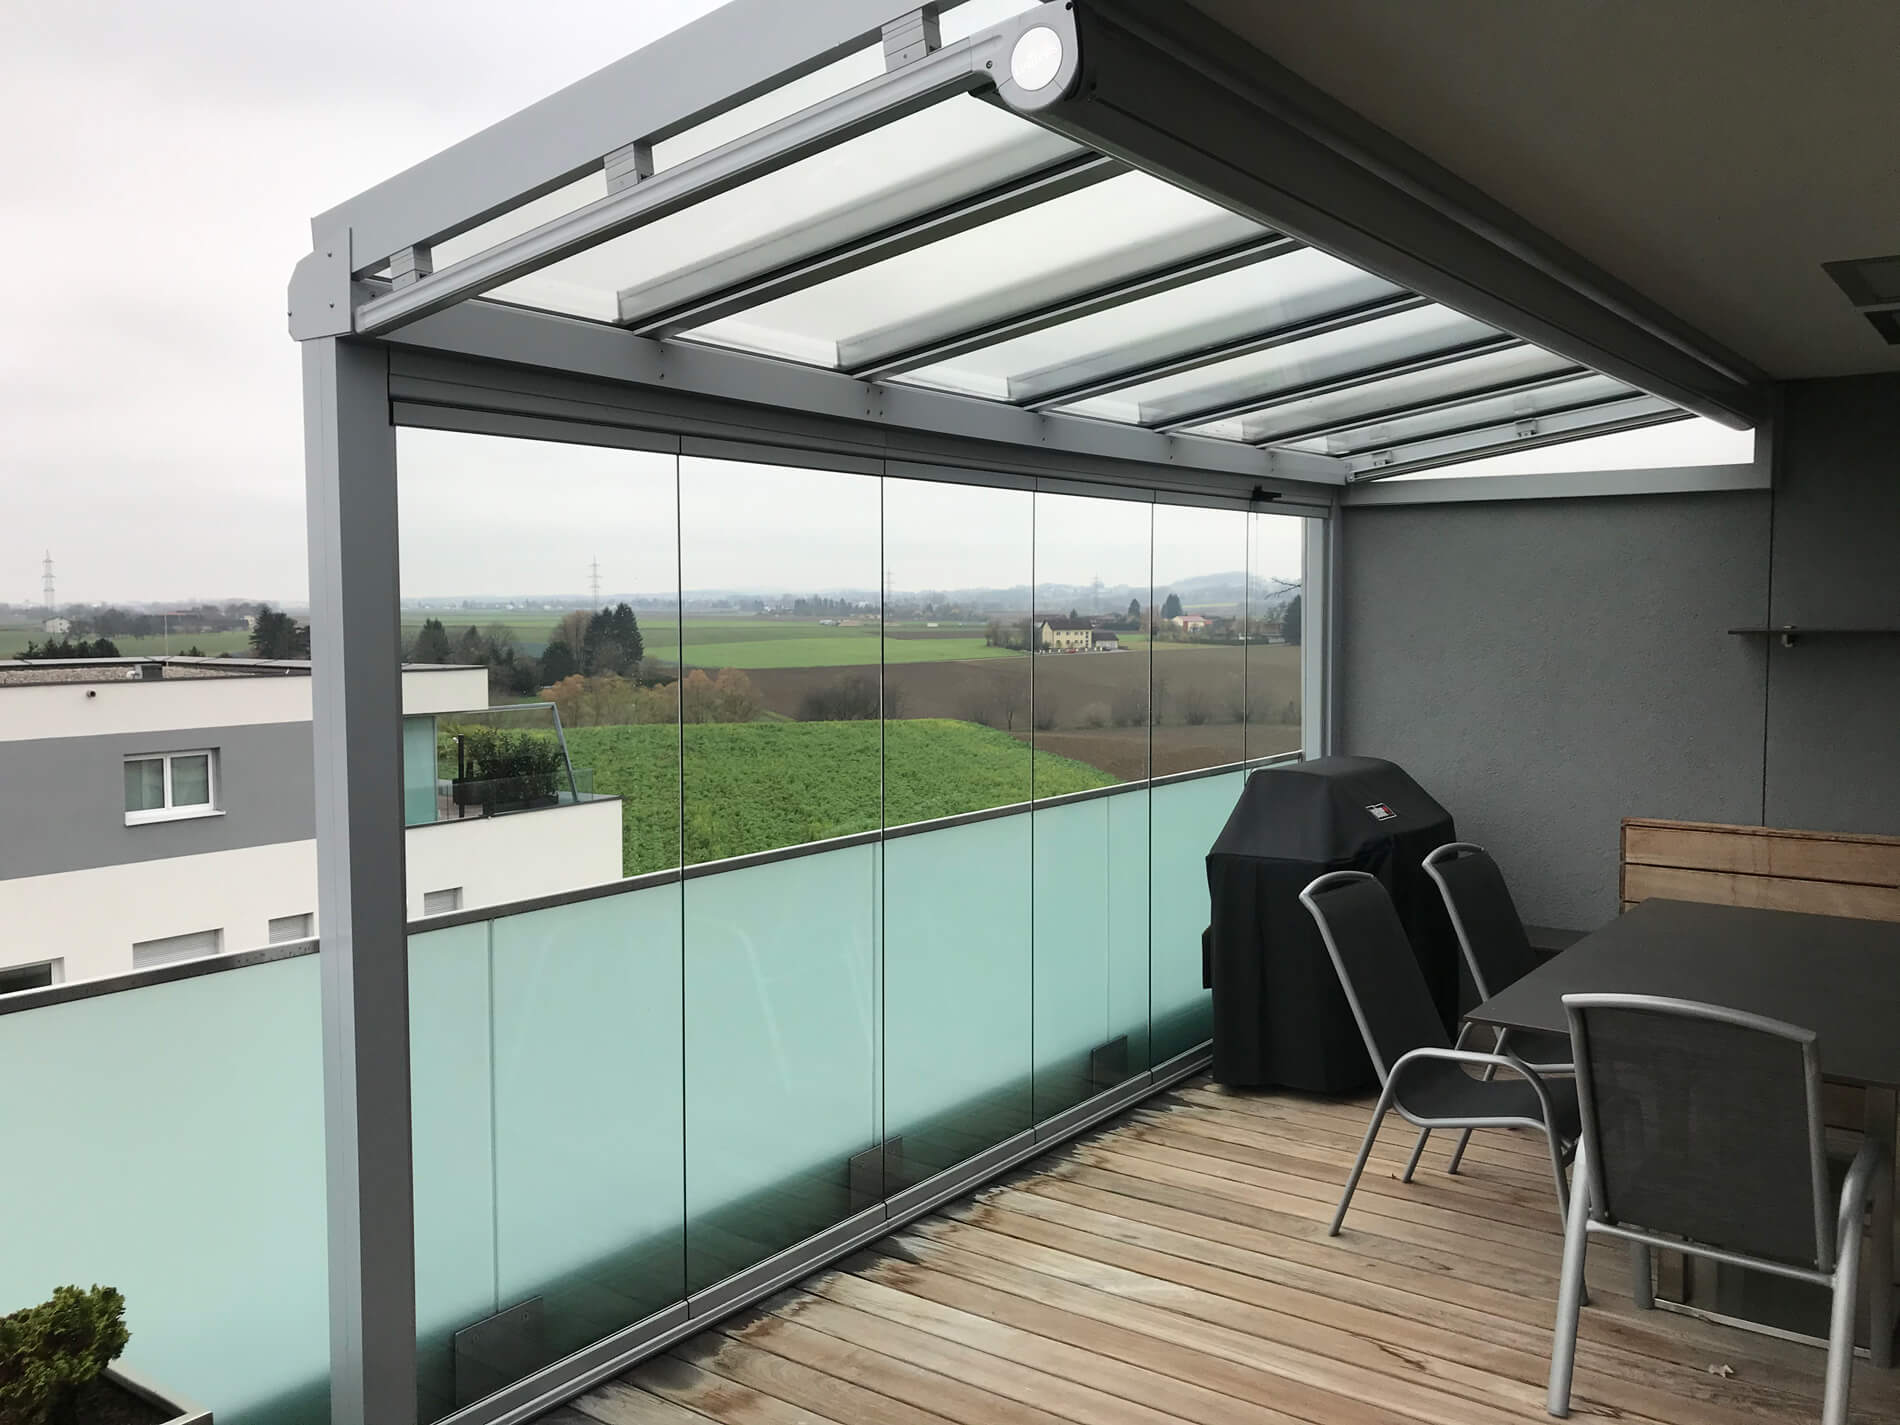 Balkonüberdachung Glas - Material Alu